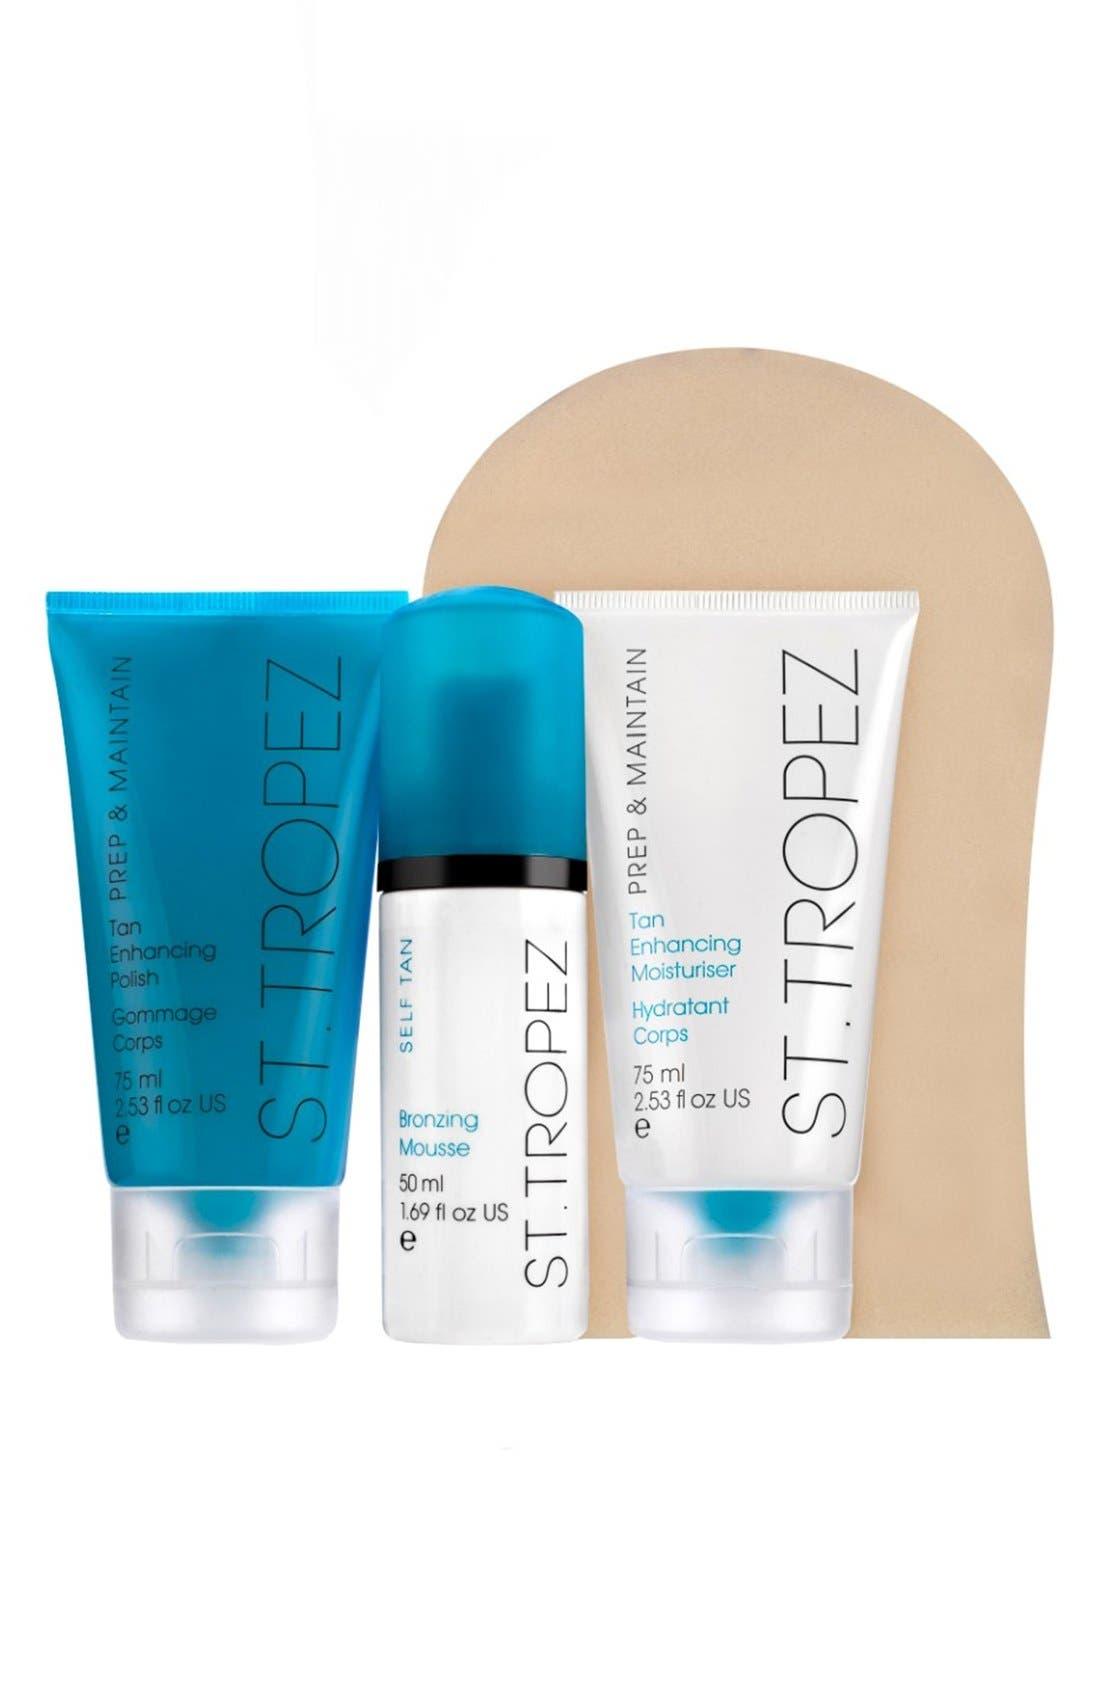 St. Tropez Self Tan Starter Kit (Limited Edition)